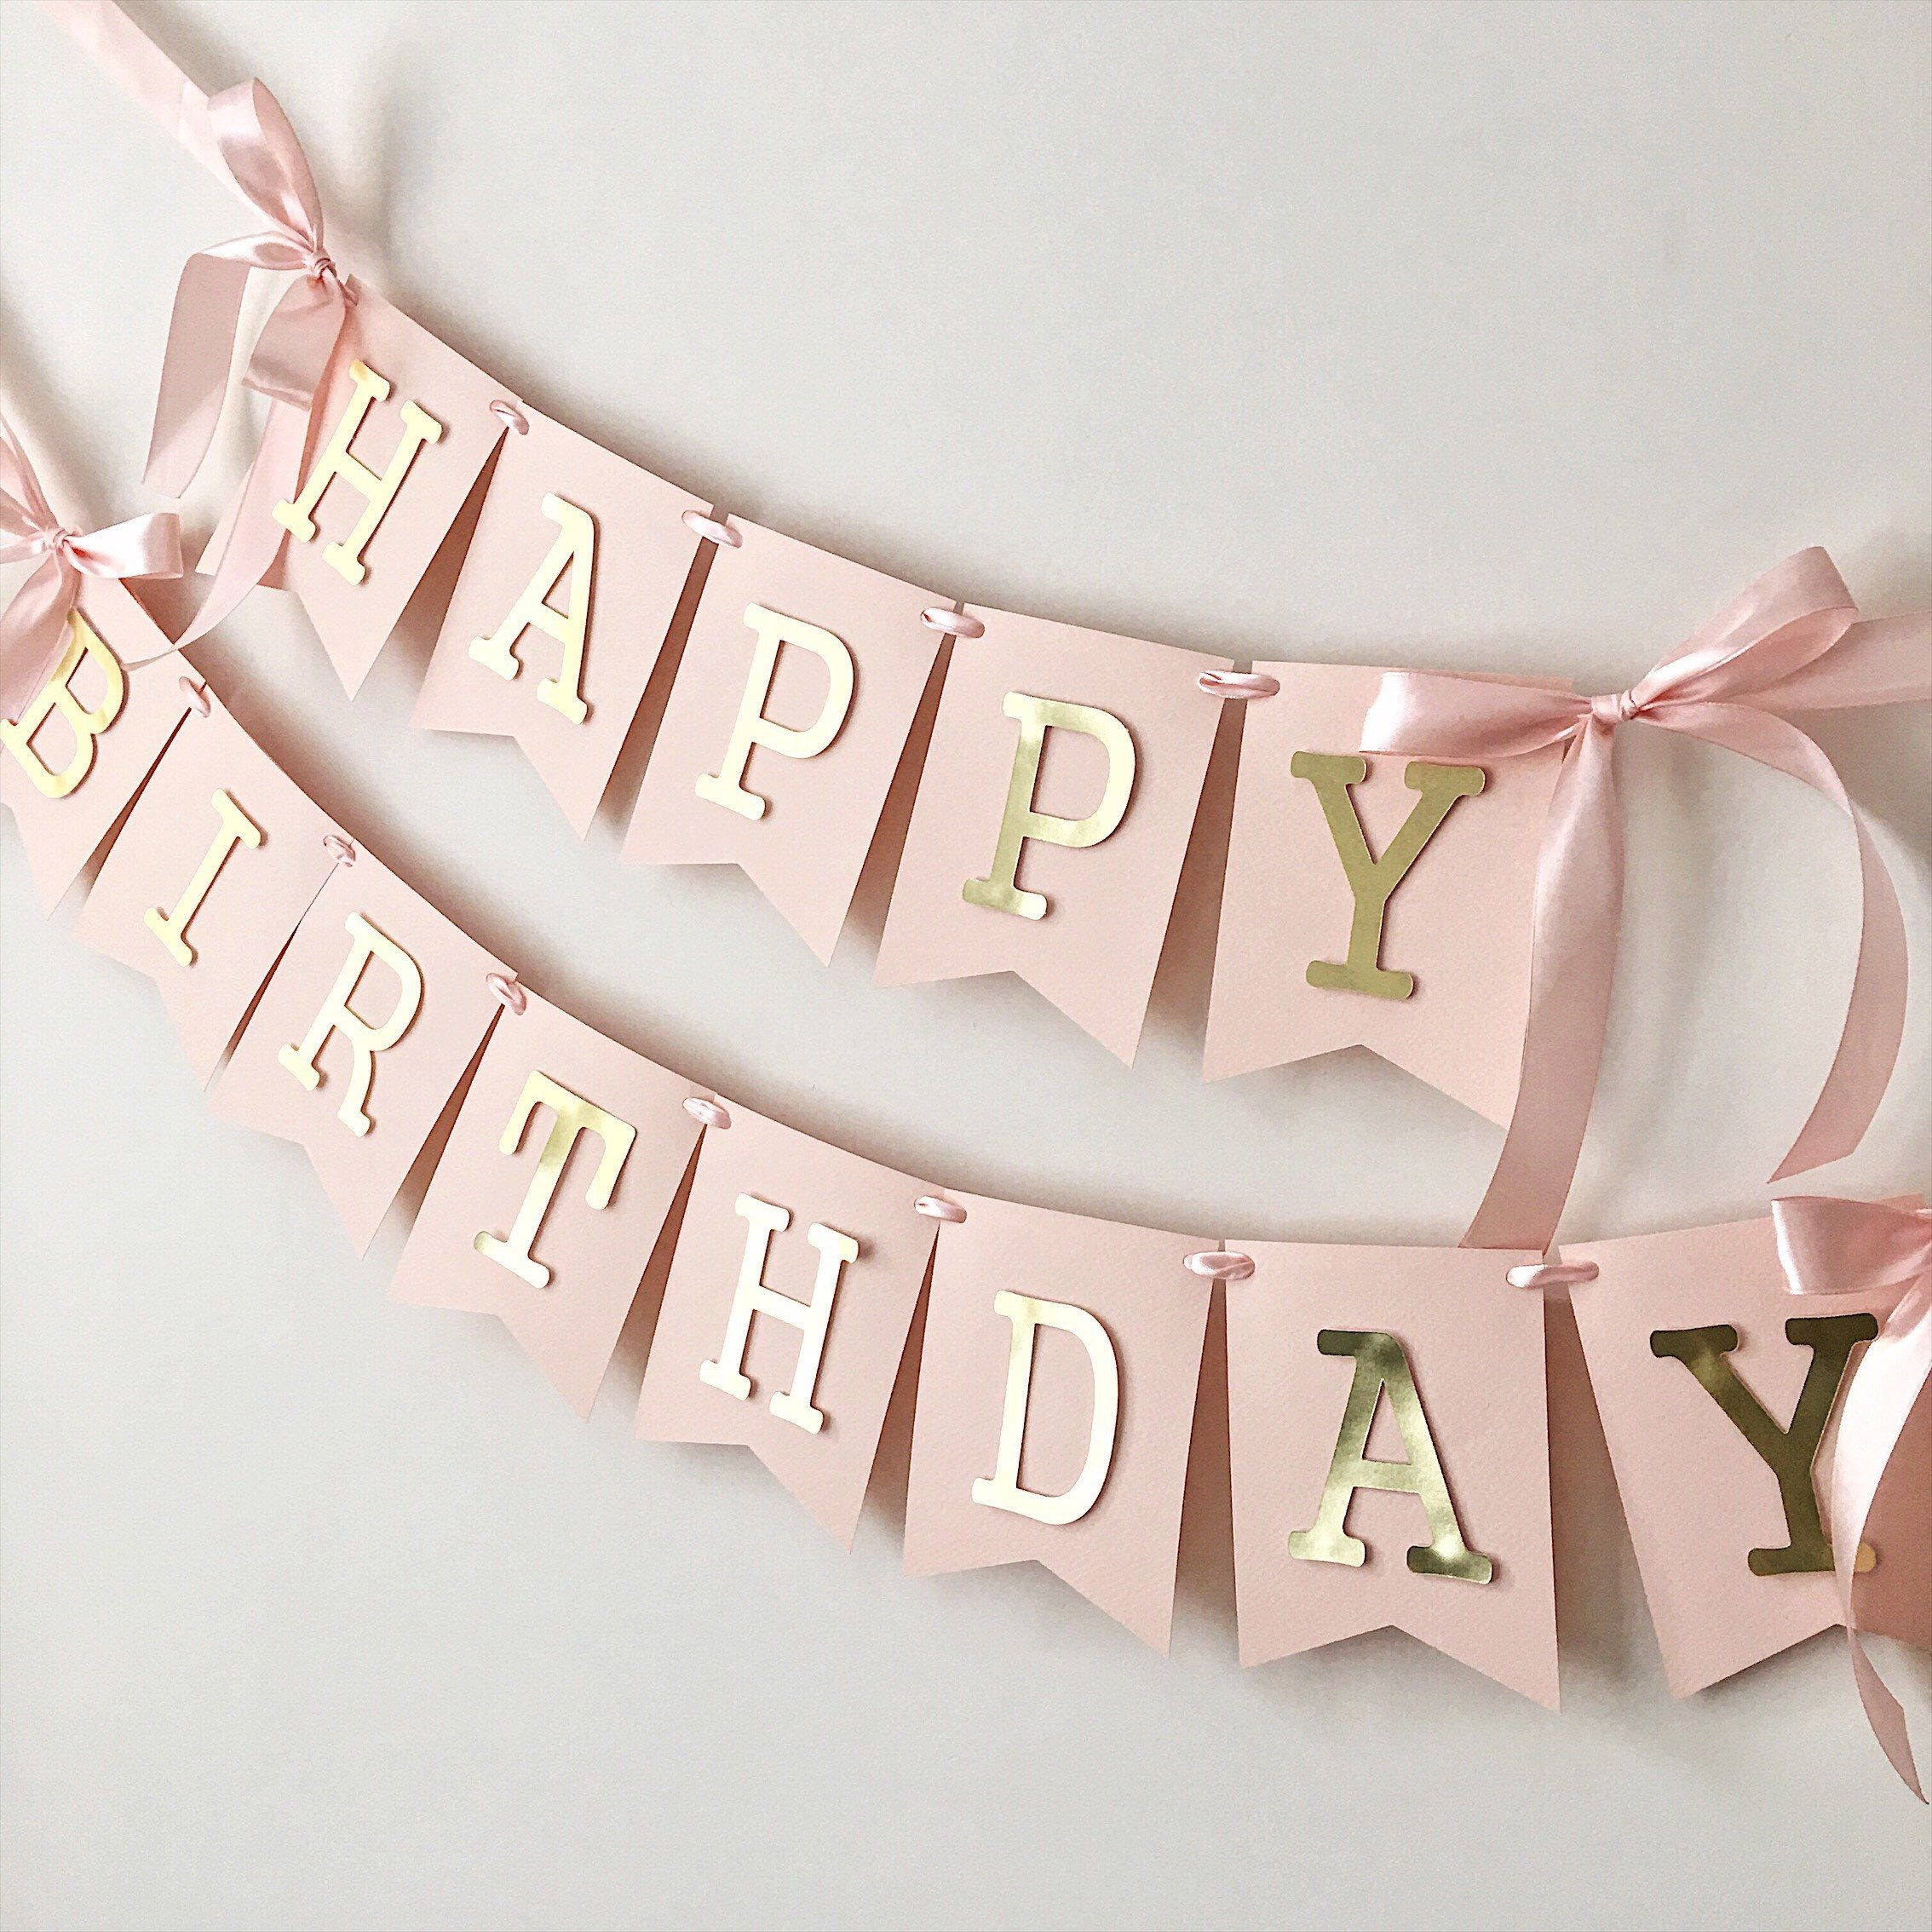 Blush Rose Gold Happy Birthday Banner Personalized Girl 1st Etsy Diy Birthday Banner Baby Birthday Party Girl Gold Birthday Party Decorations